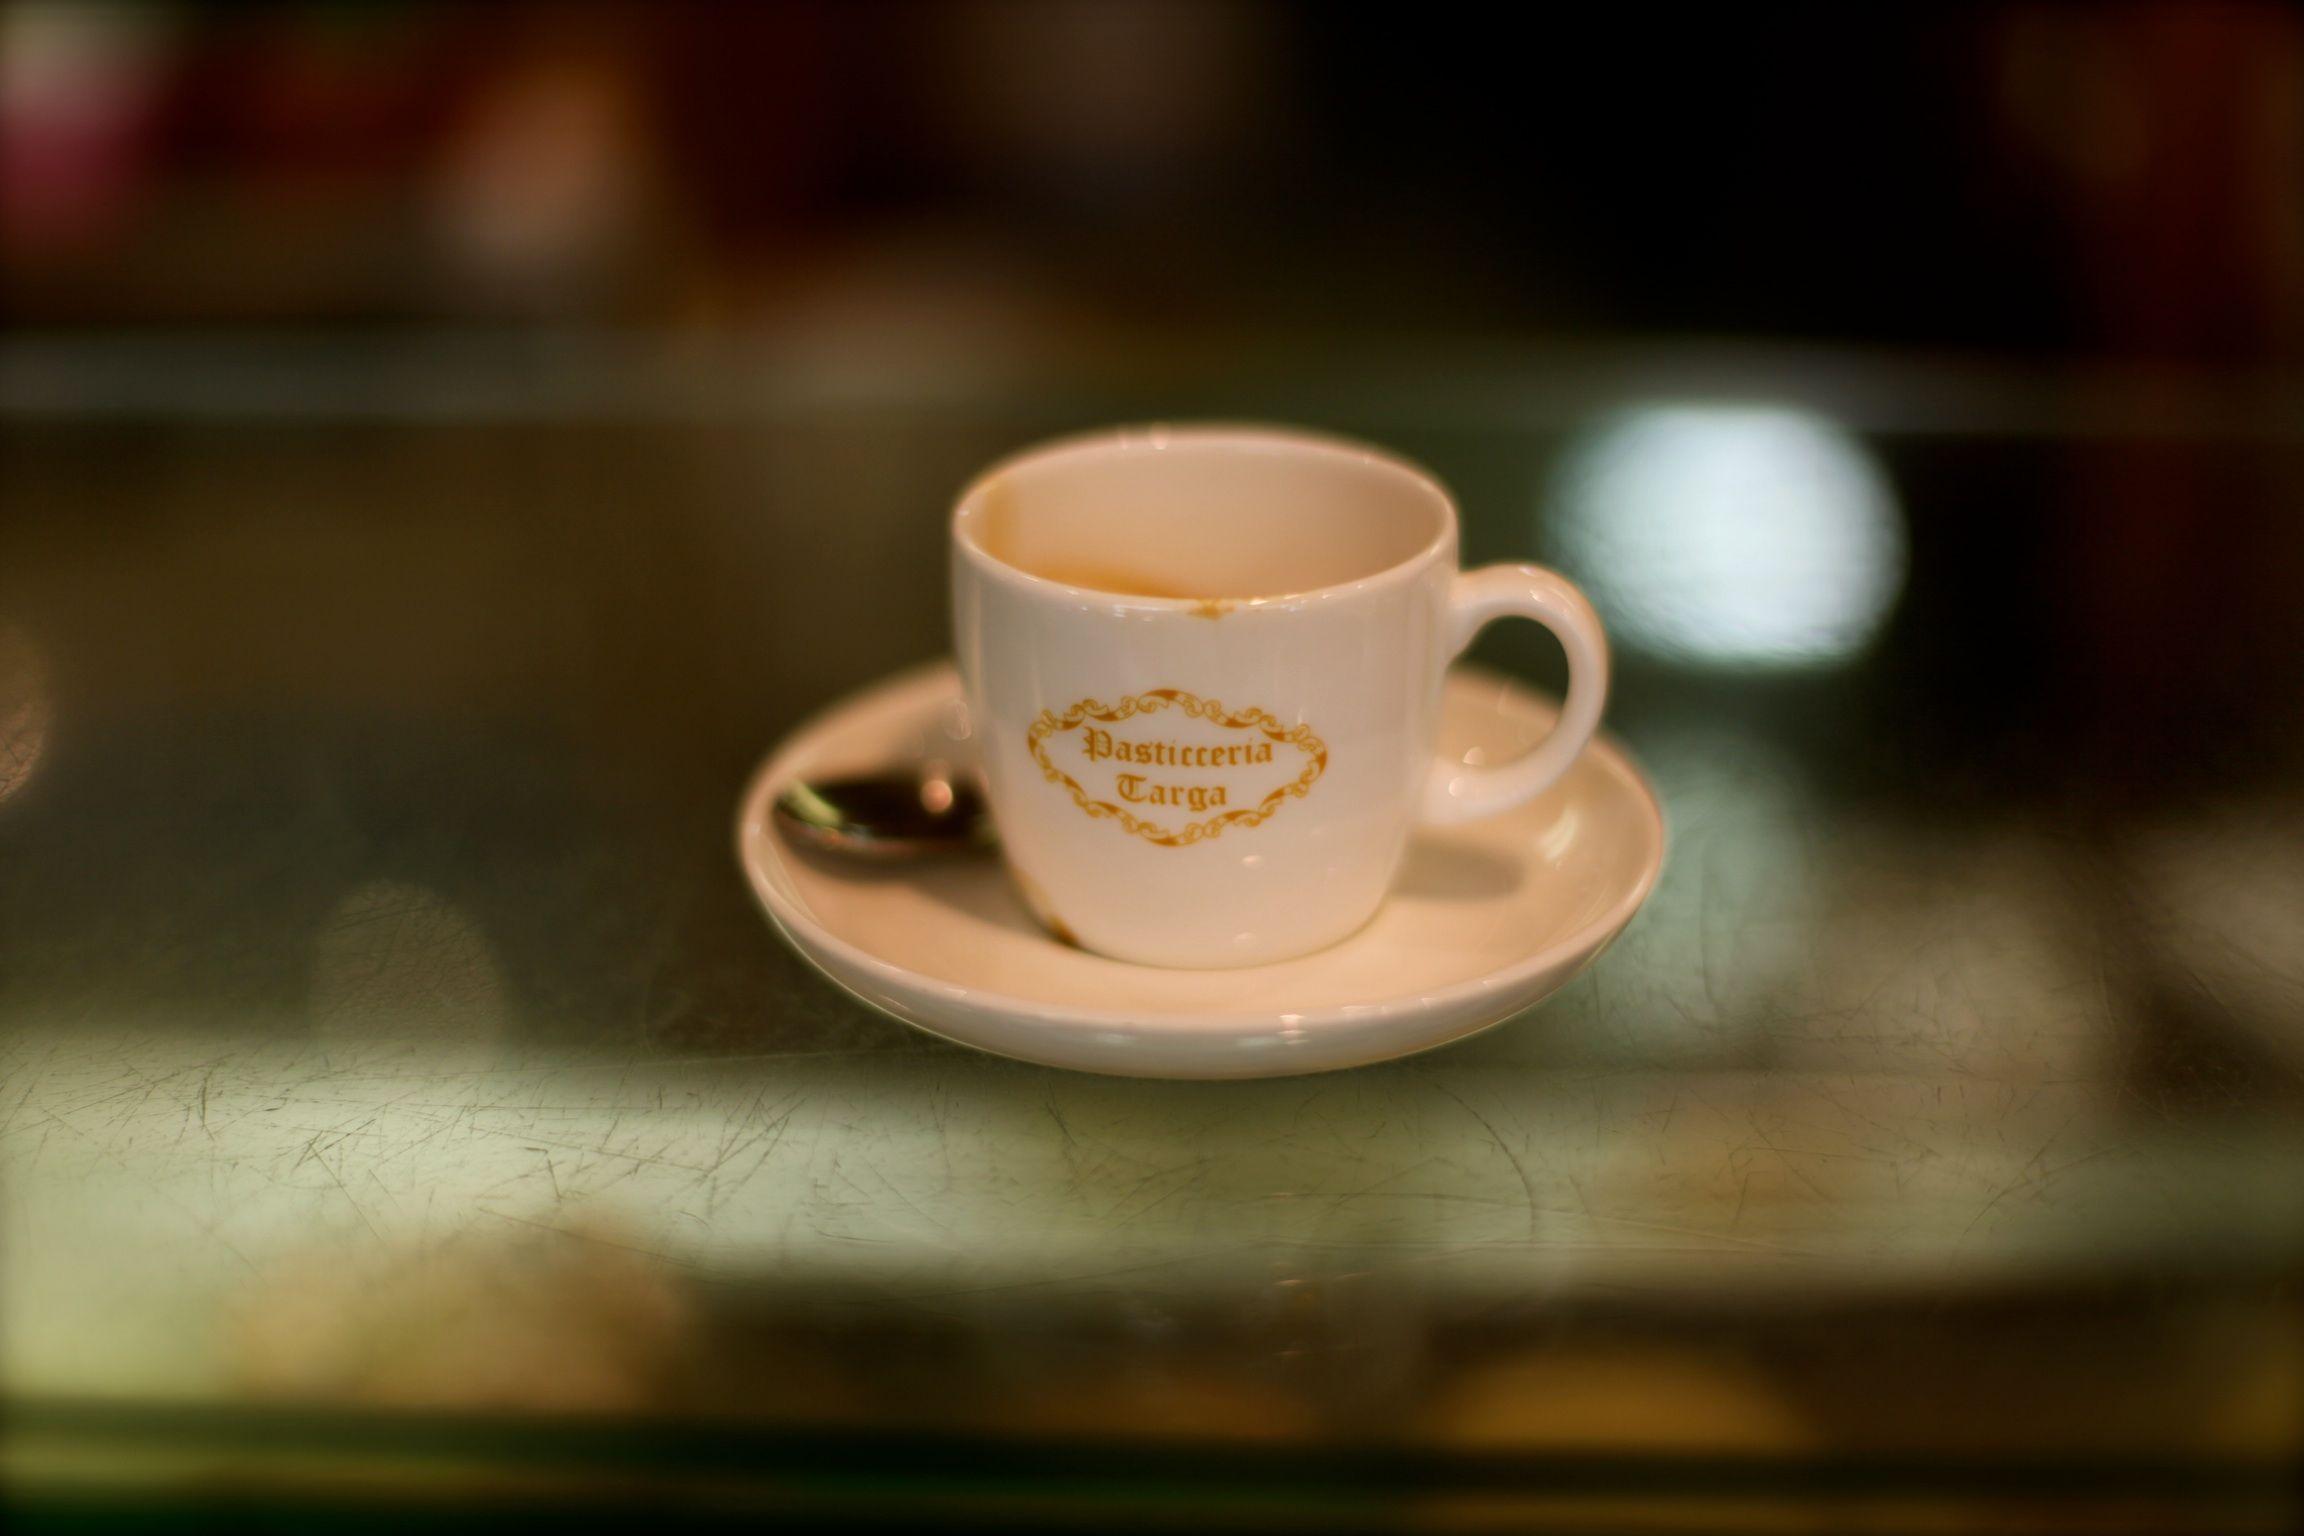 An Espresso, Venice, Italy